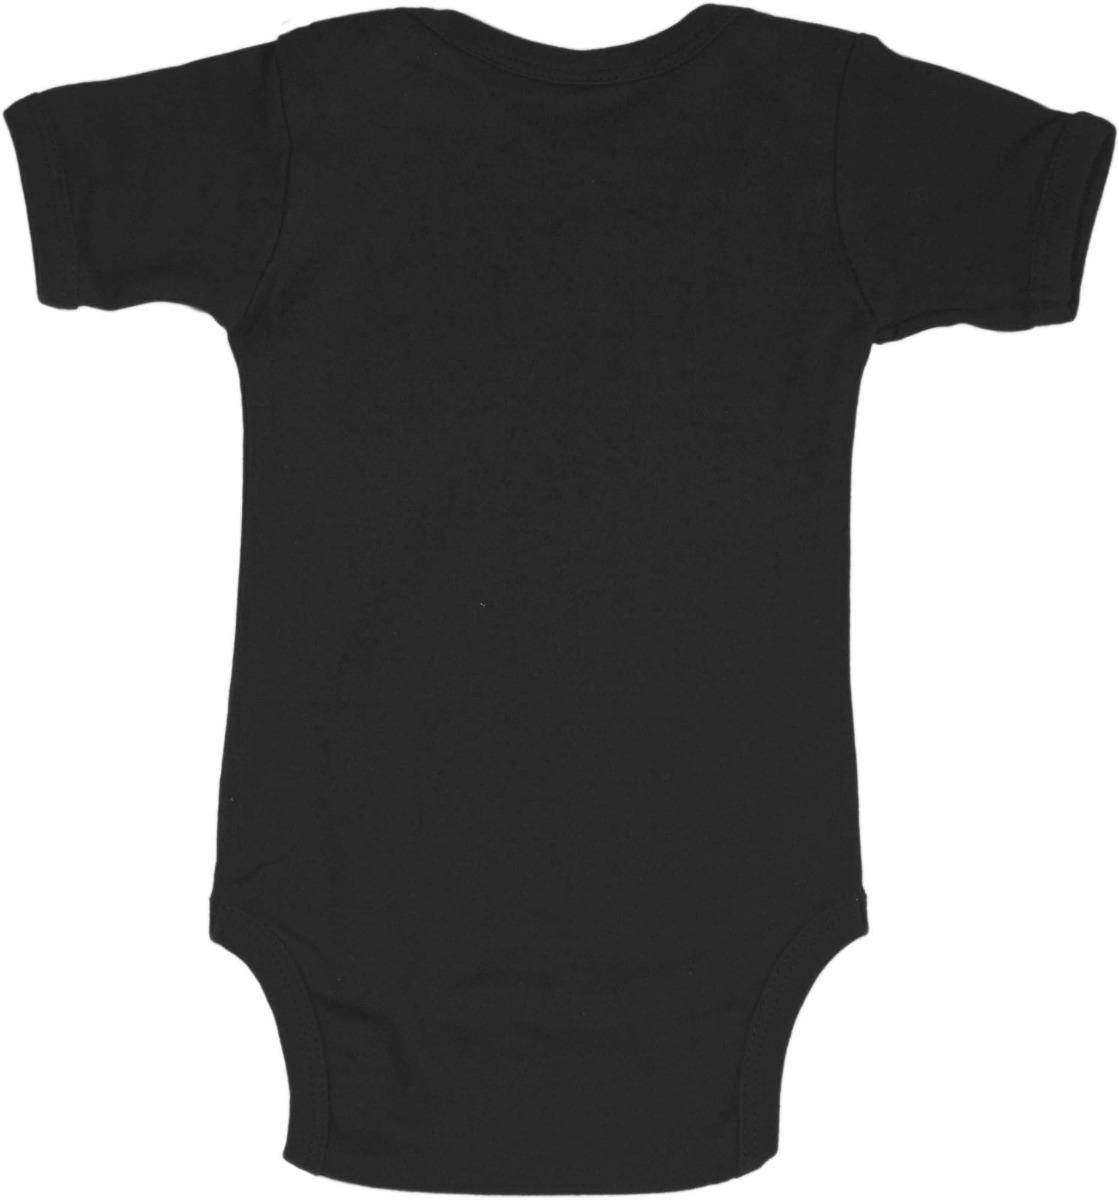 body bebê rock mickey metal roupas menino menina. Carregando zoom. bcc0895798c